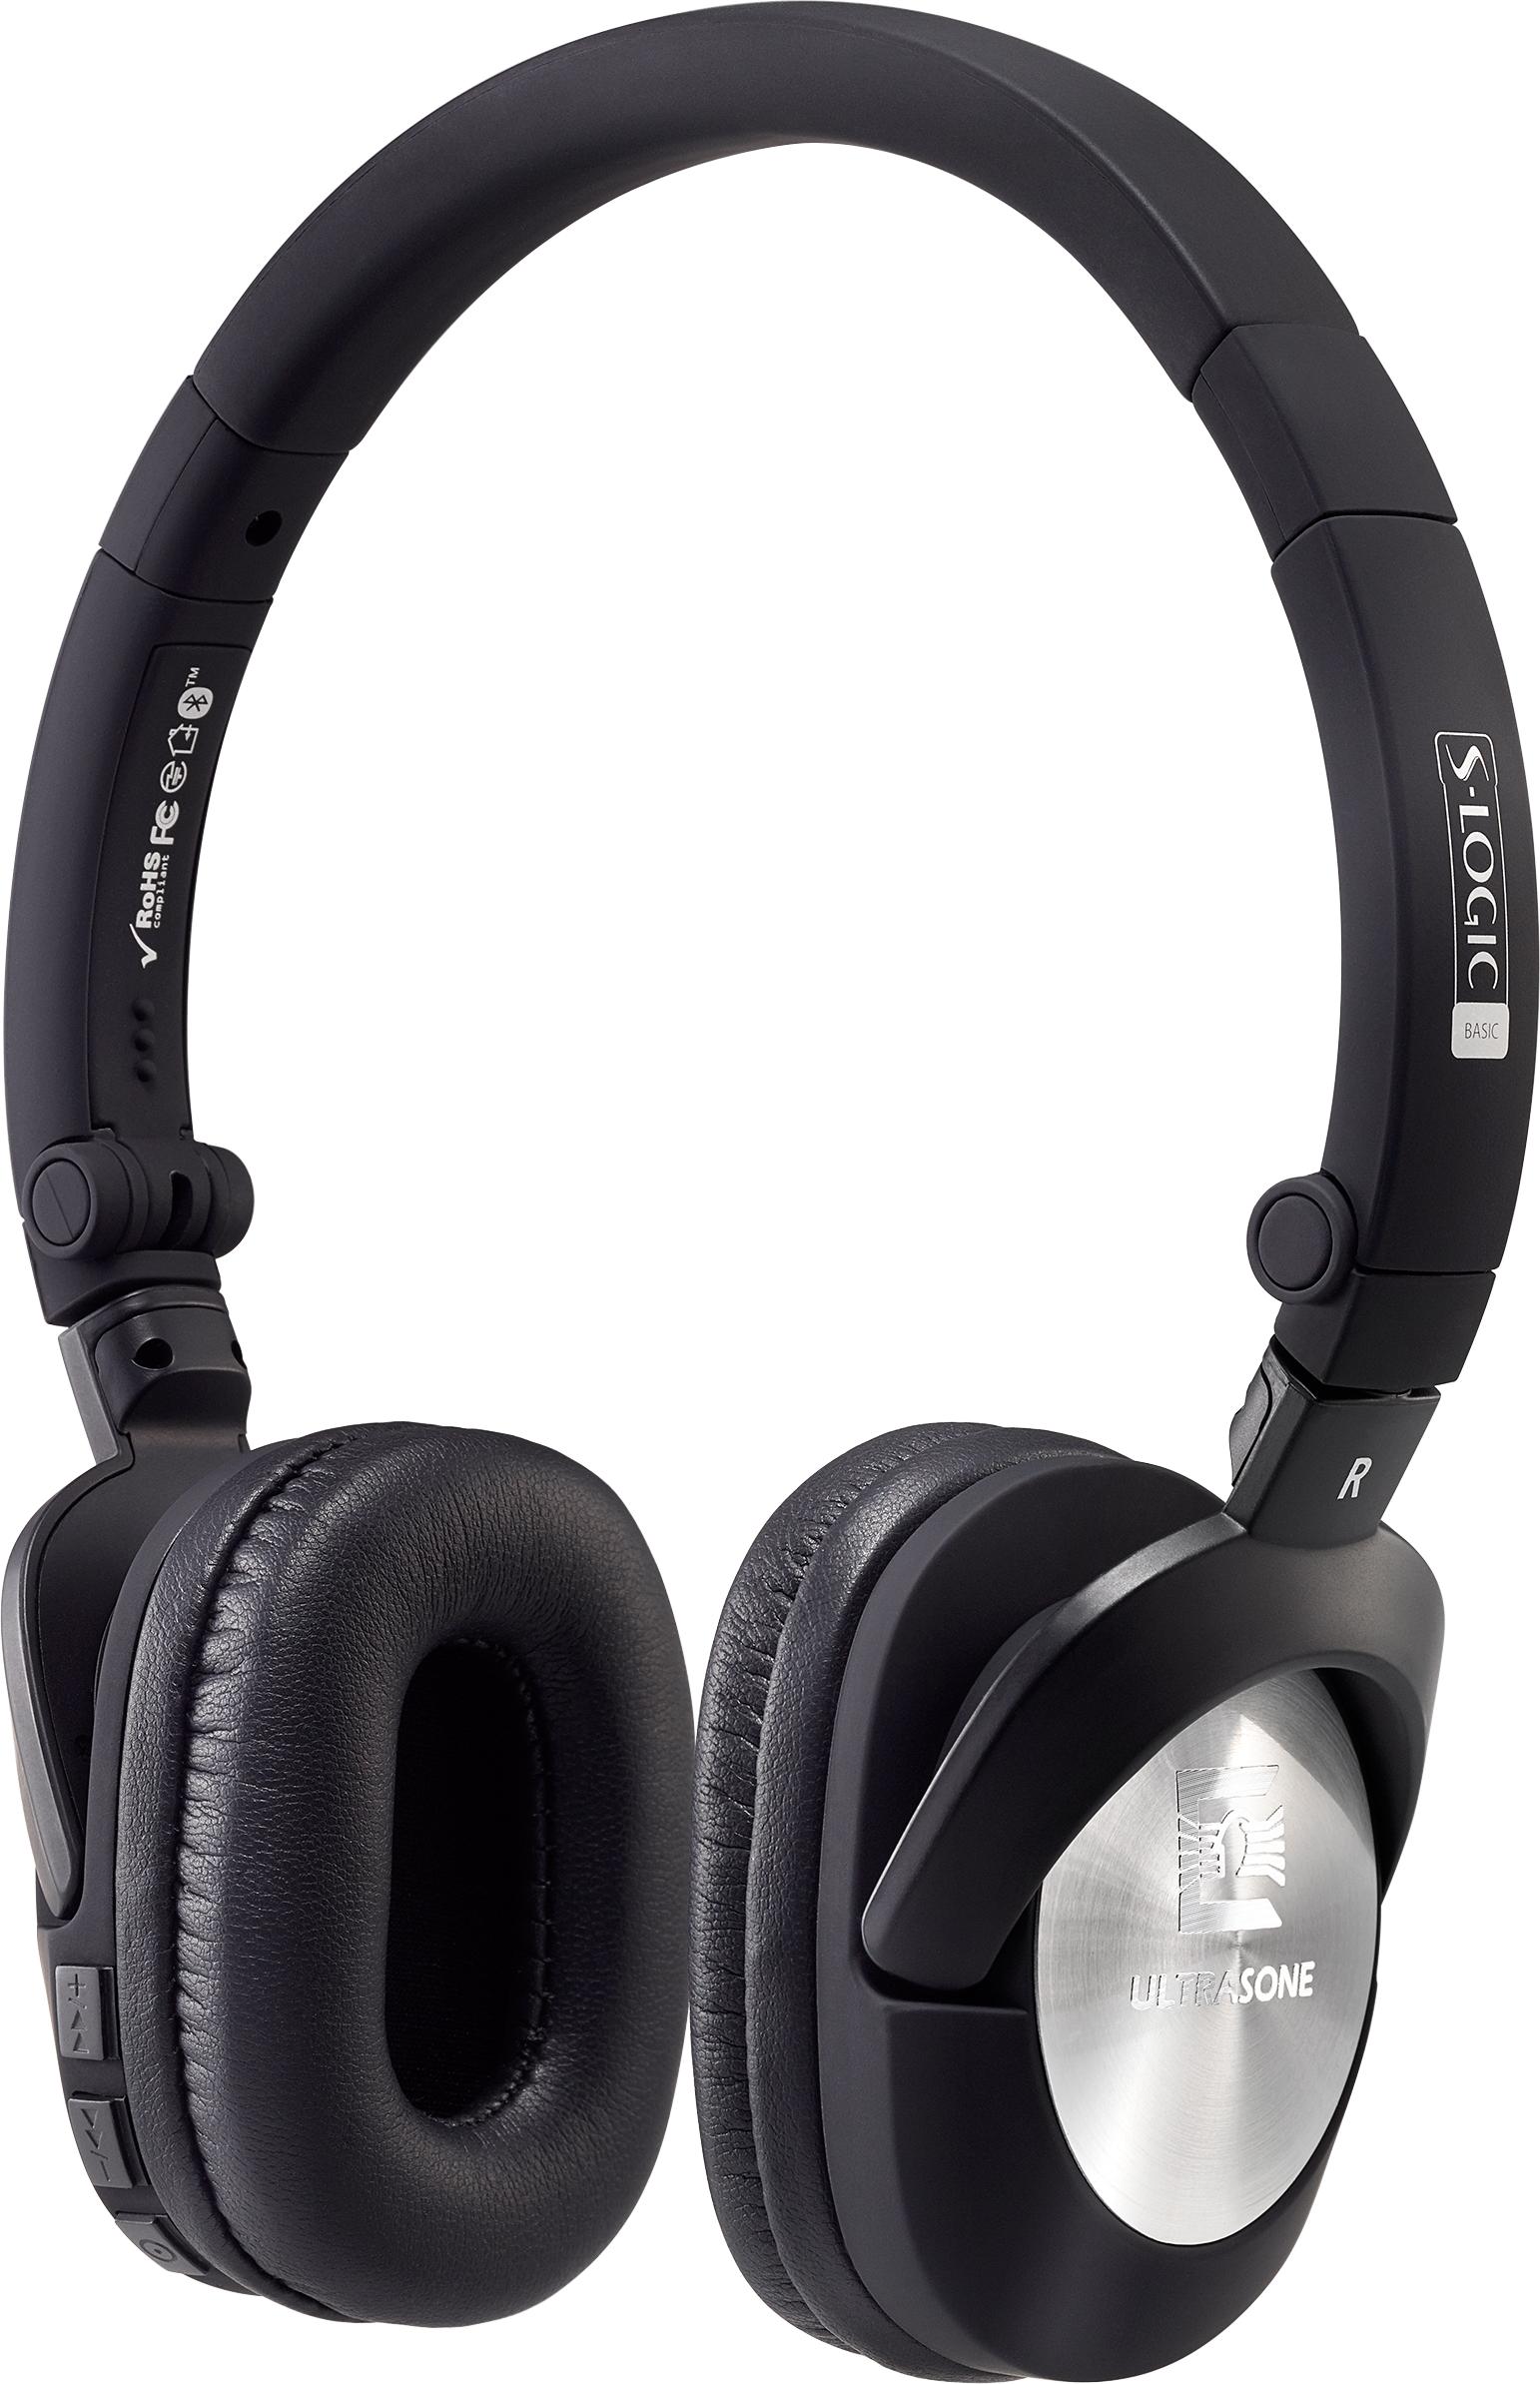 audio - CASQUES, ECOUTEURS, EAR MONITOR - CASQUES - ULTRASONE - ULTGO - Royez Musik